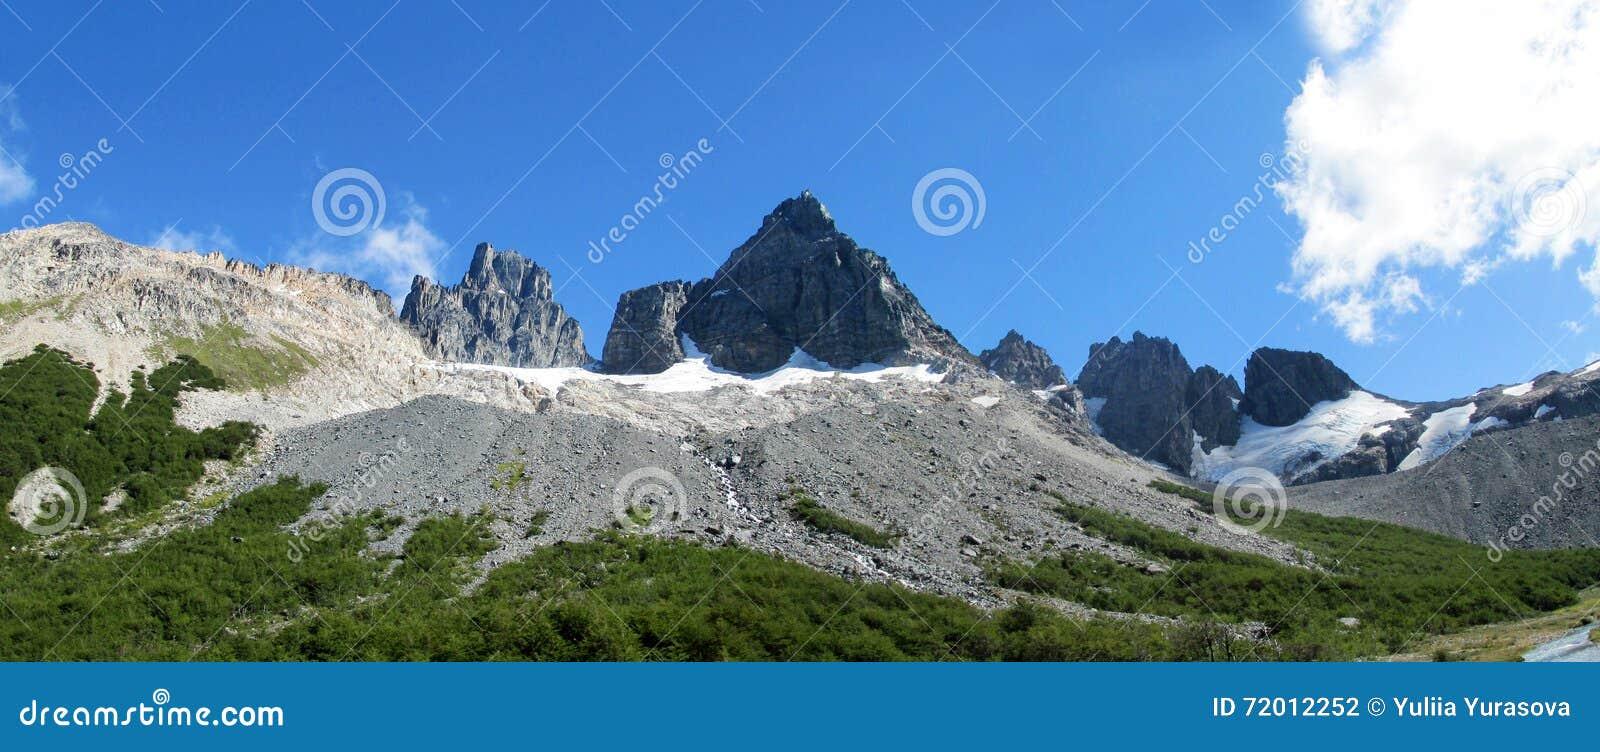 Rotsachtige berg in Chili Patagonië langs Zuidelijke Carretera